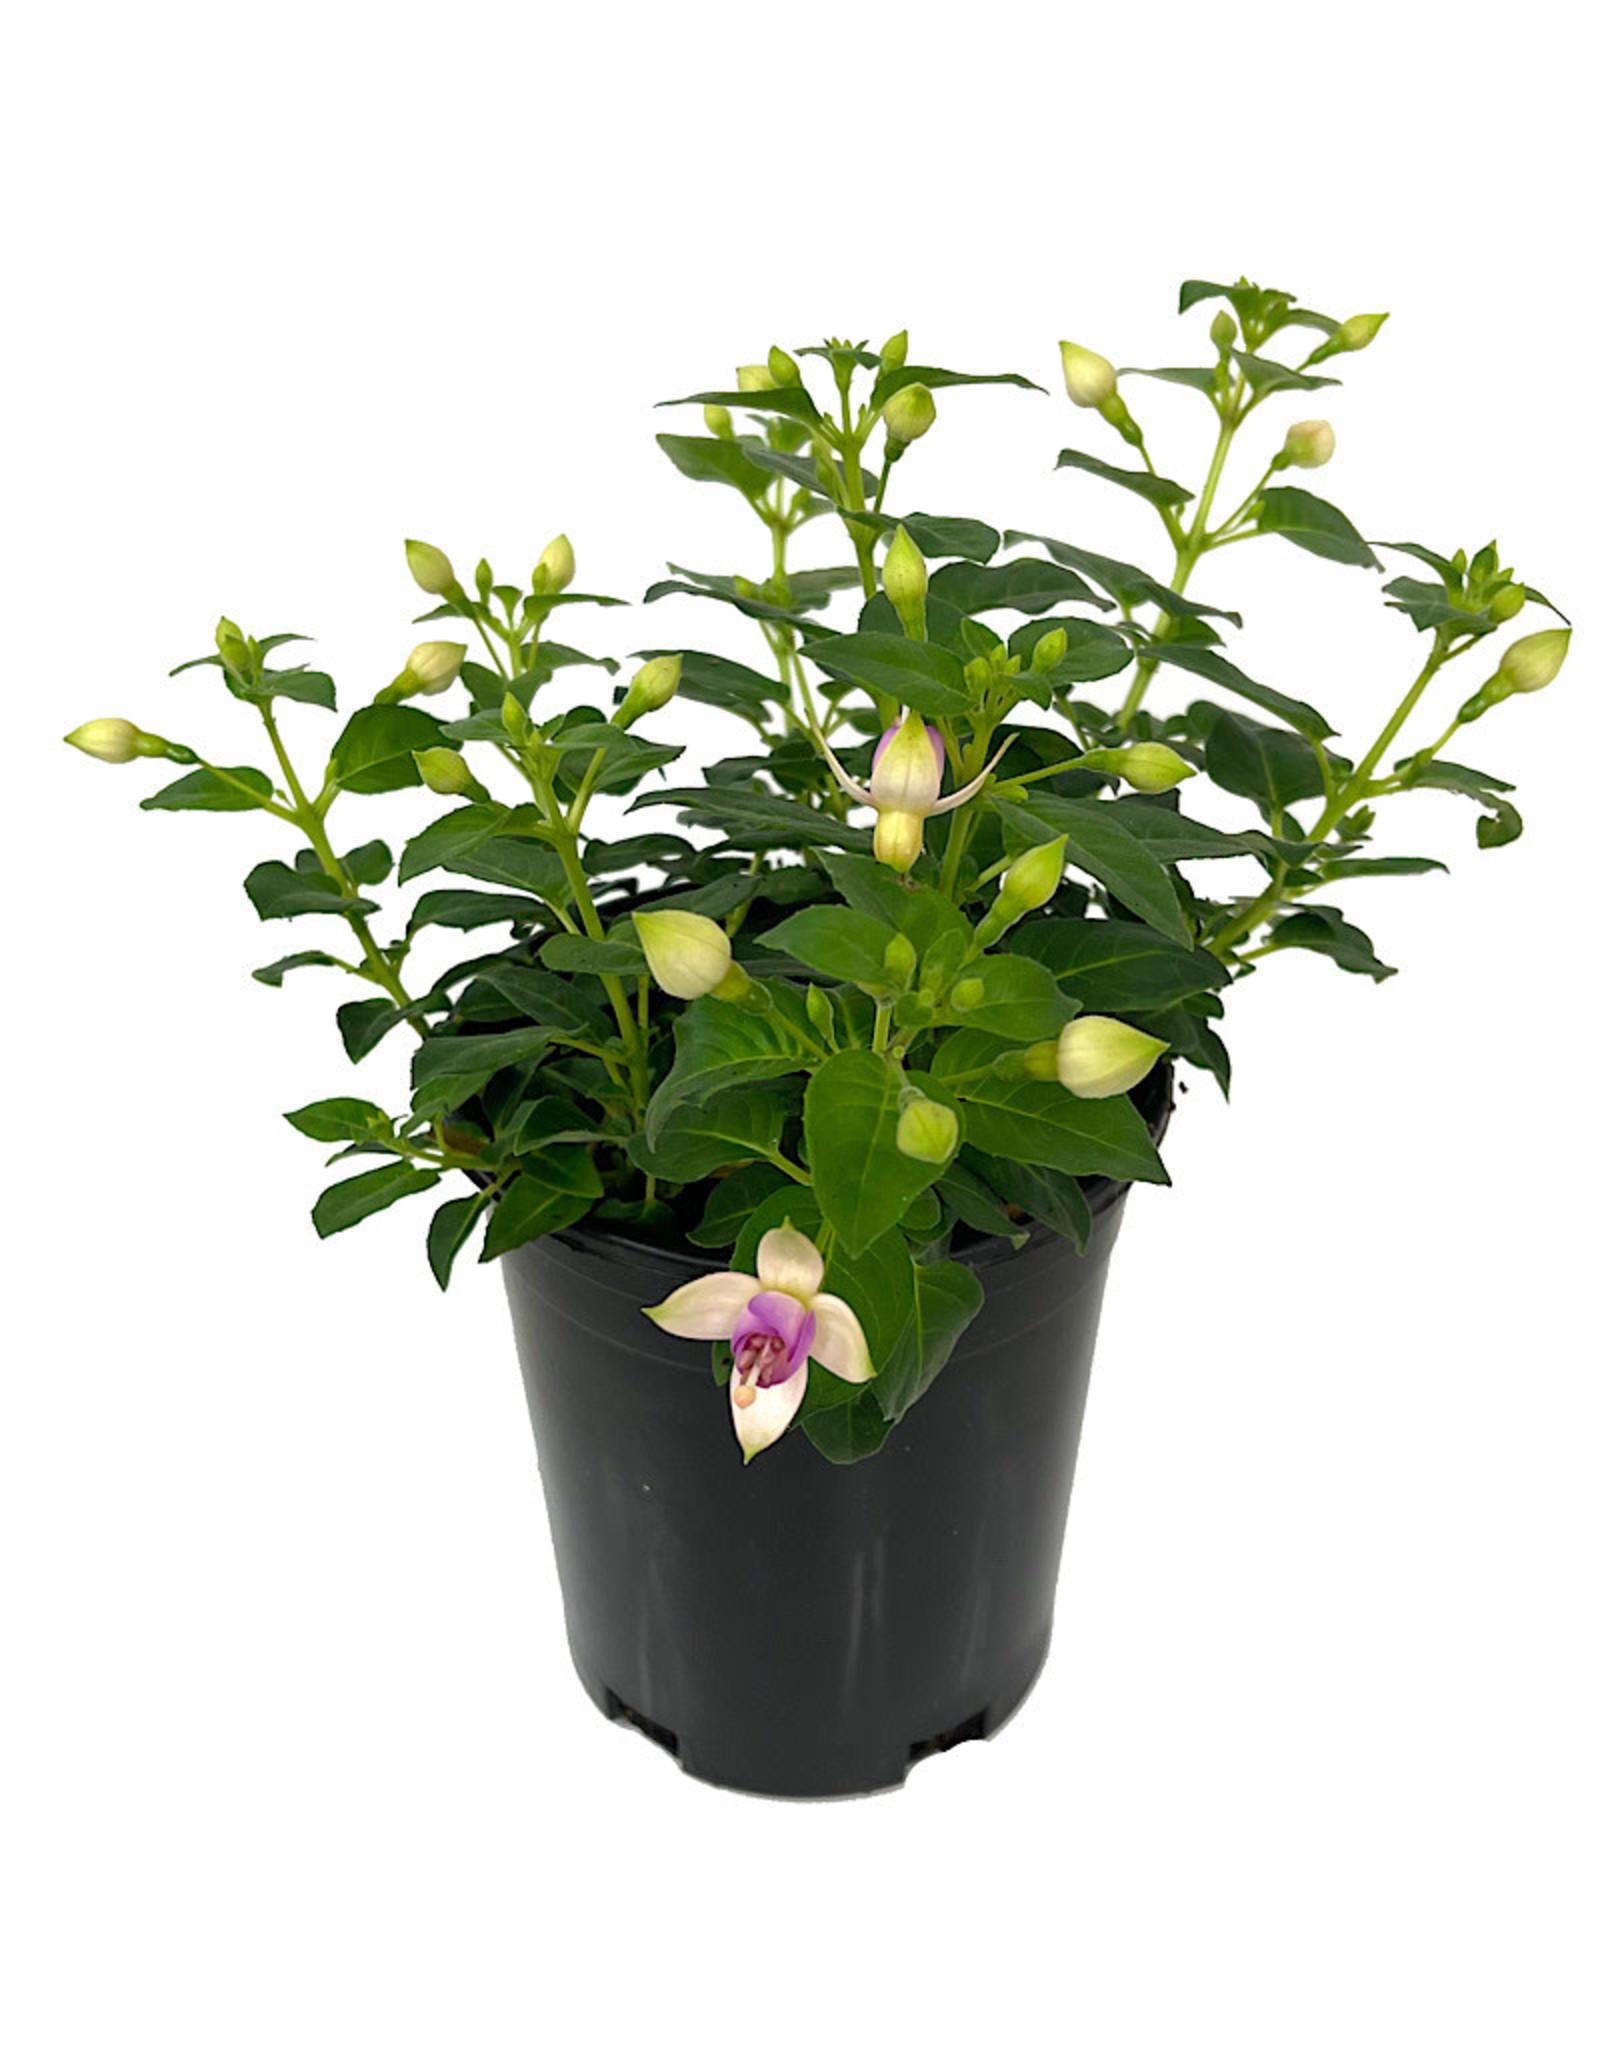 Fuchsia 'Erecta' 1 Gallon